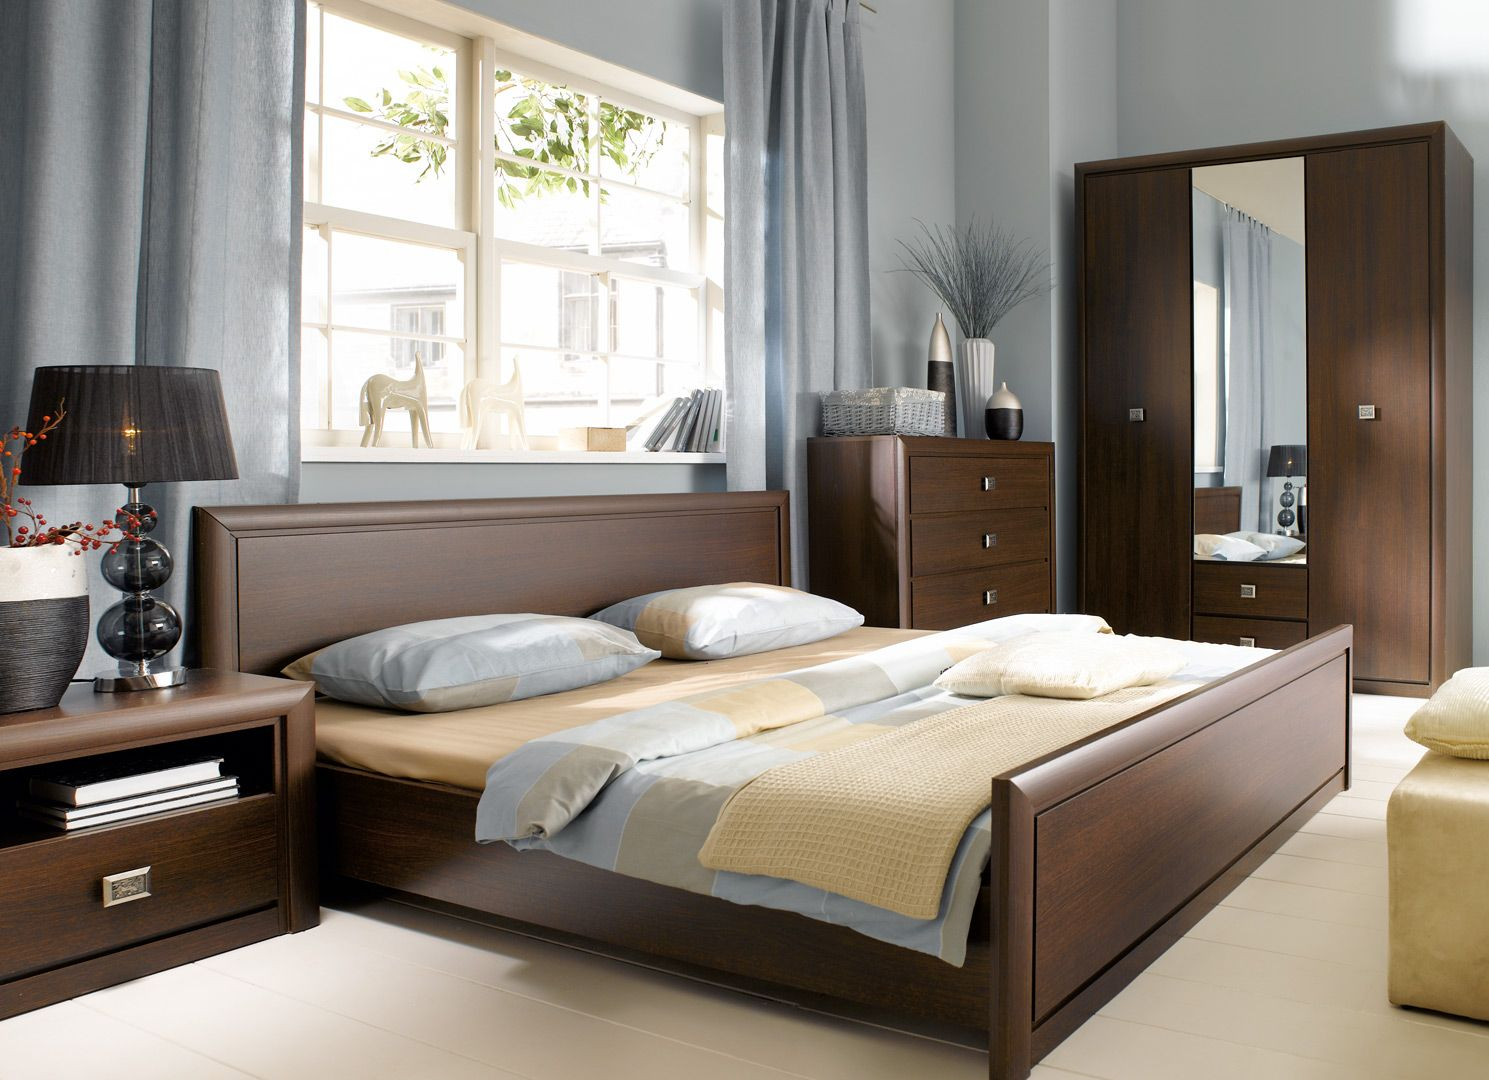 Belhouse Bedroom Bed Design Cheap Bedroom Sets Bedroom Design